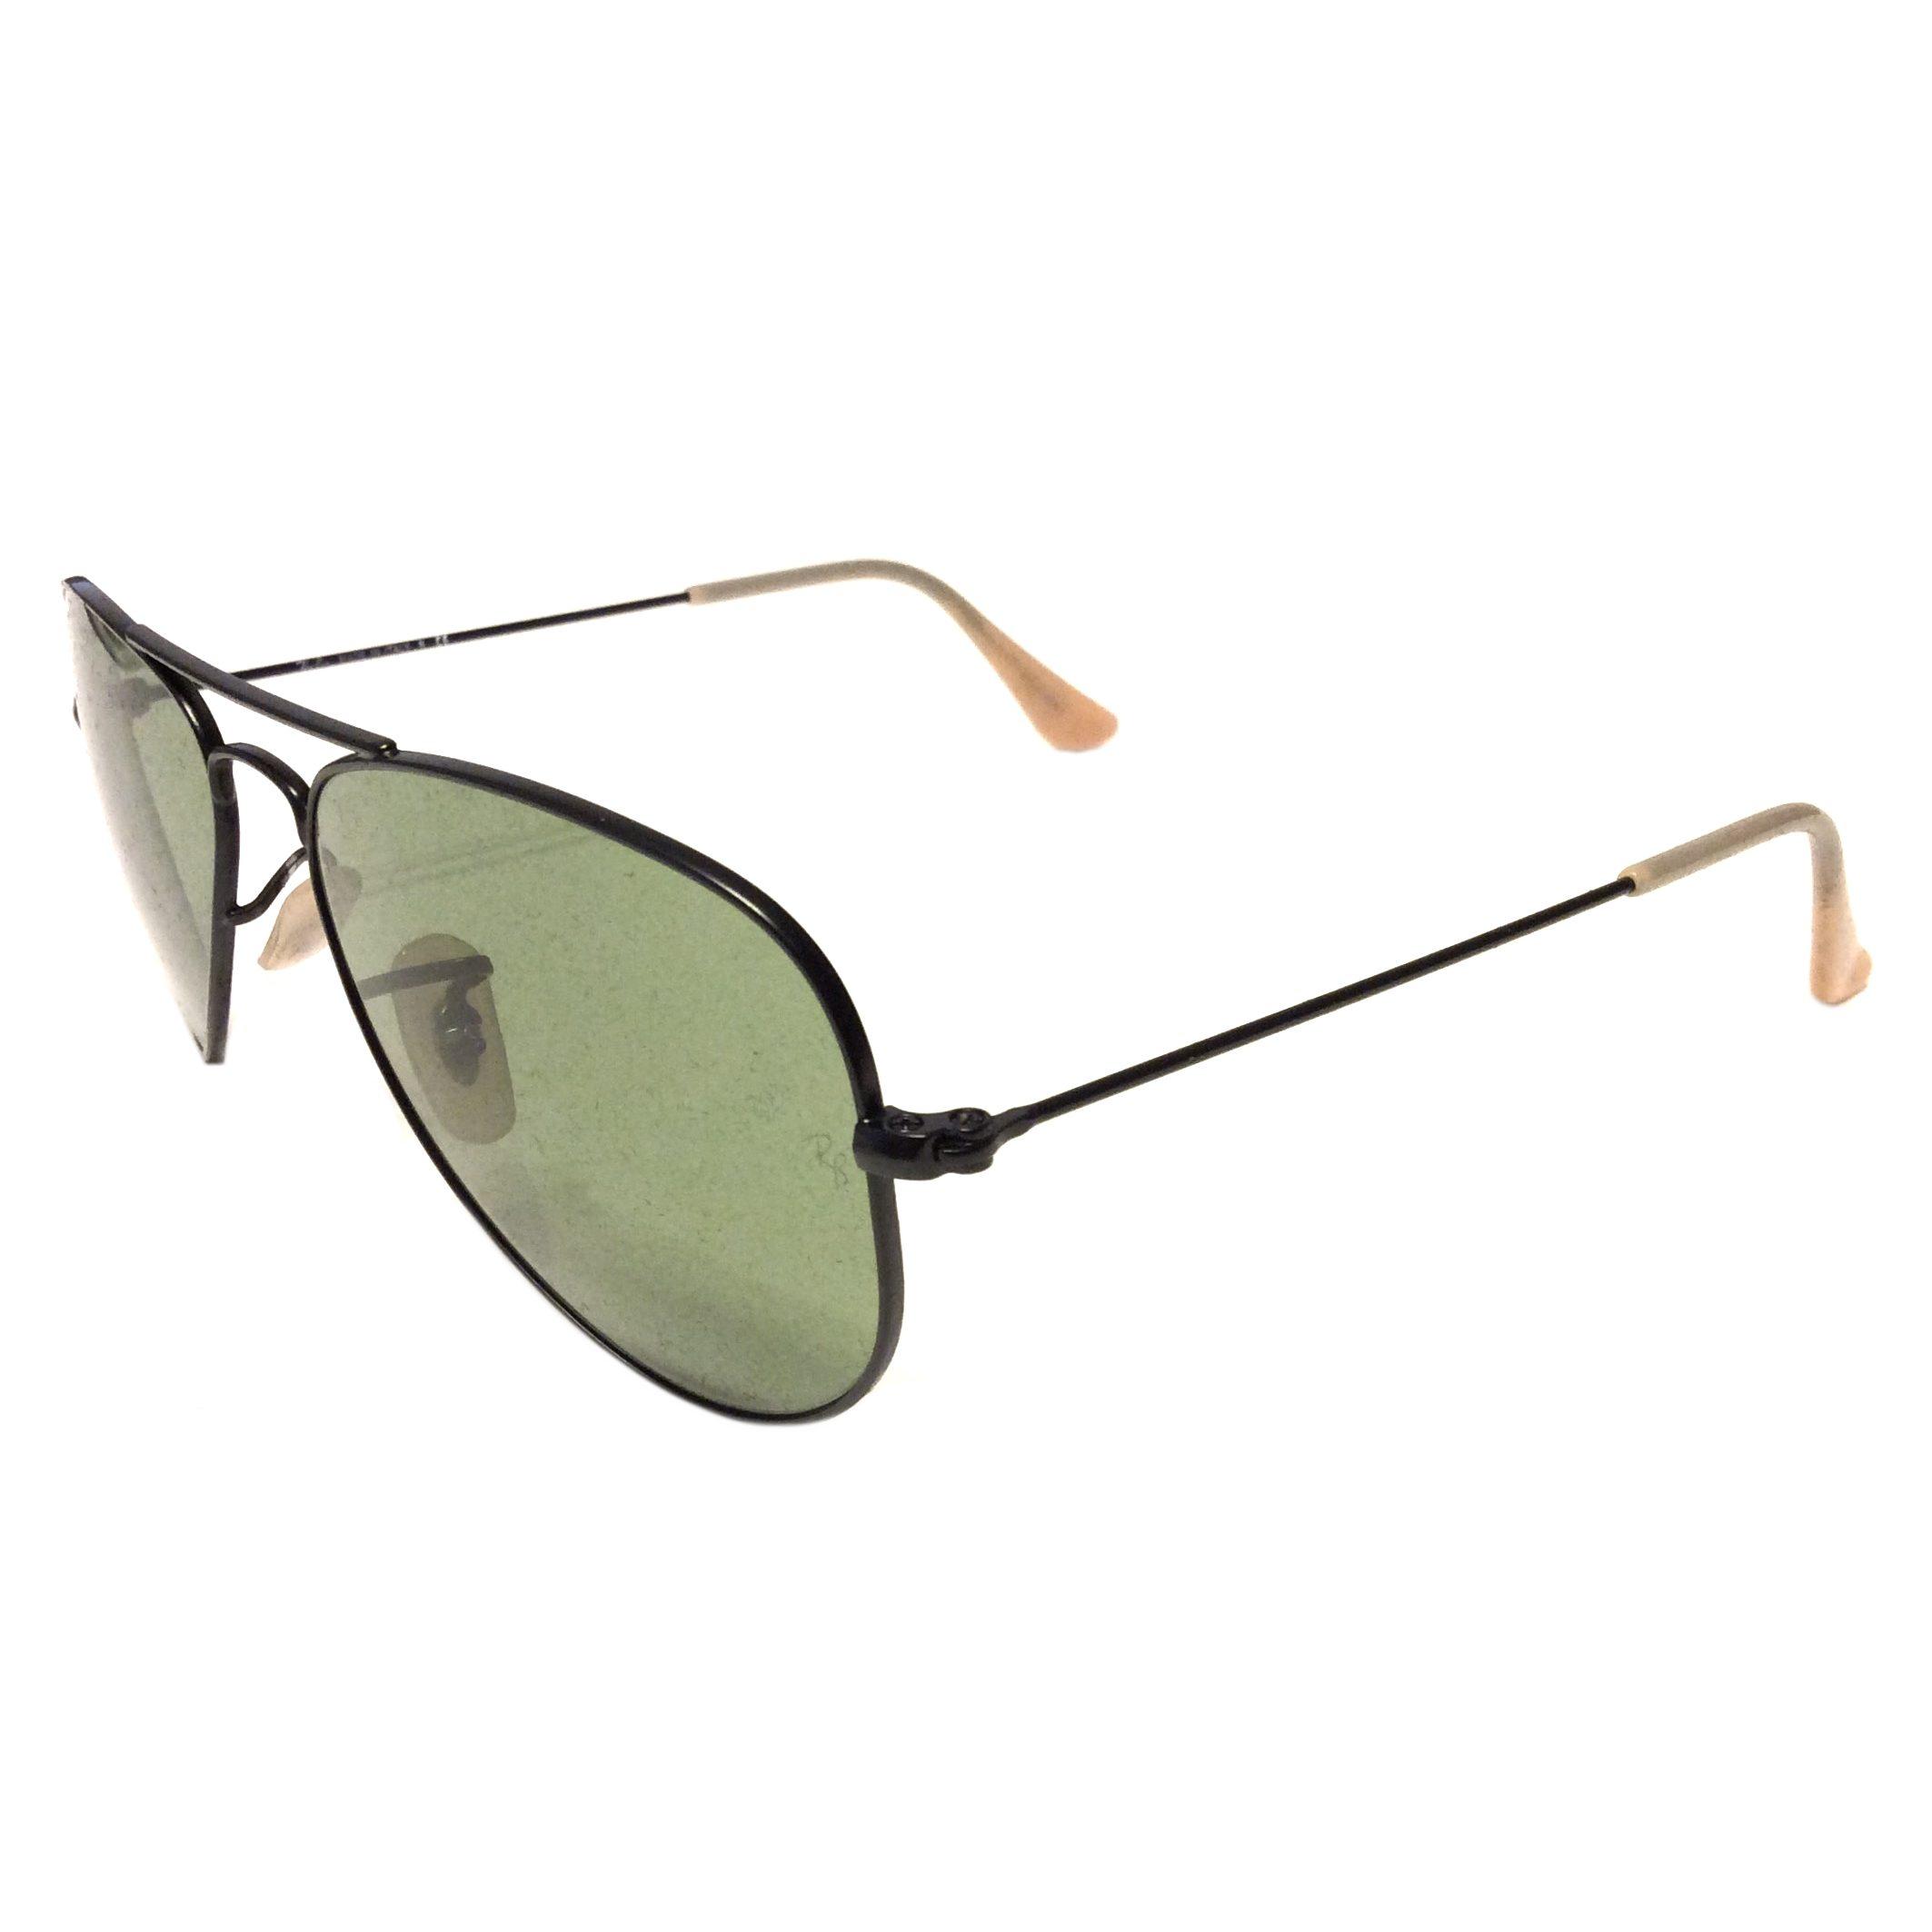 Ray-Ban Aviator Sunglasses -SMALL 52mm Matte Black - Green Lens - RB3044